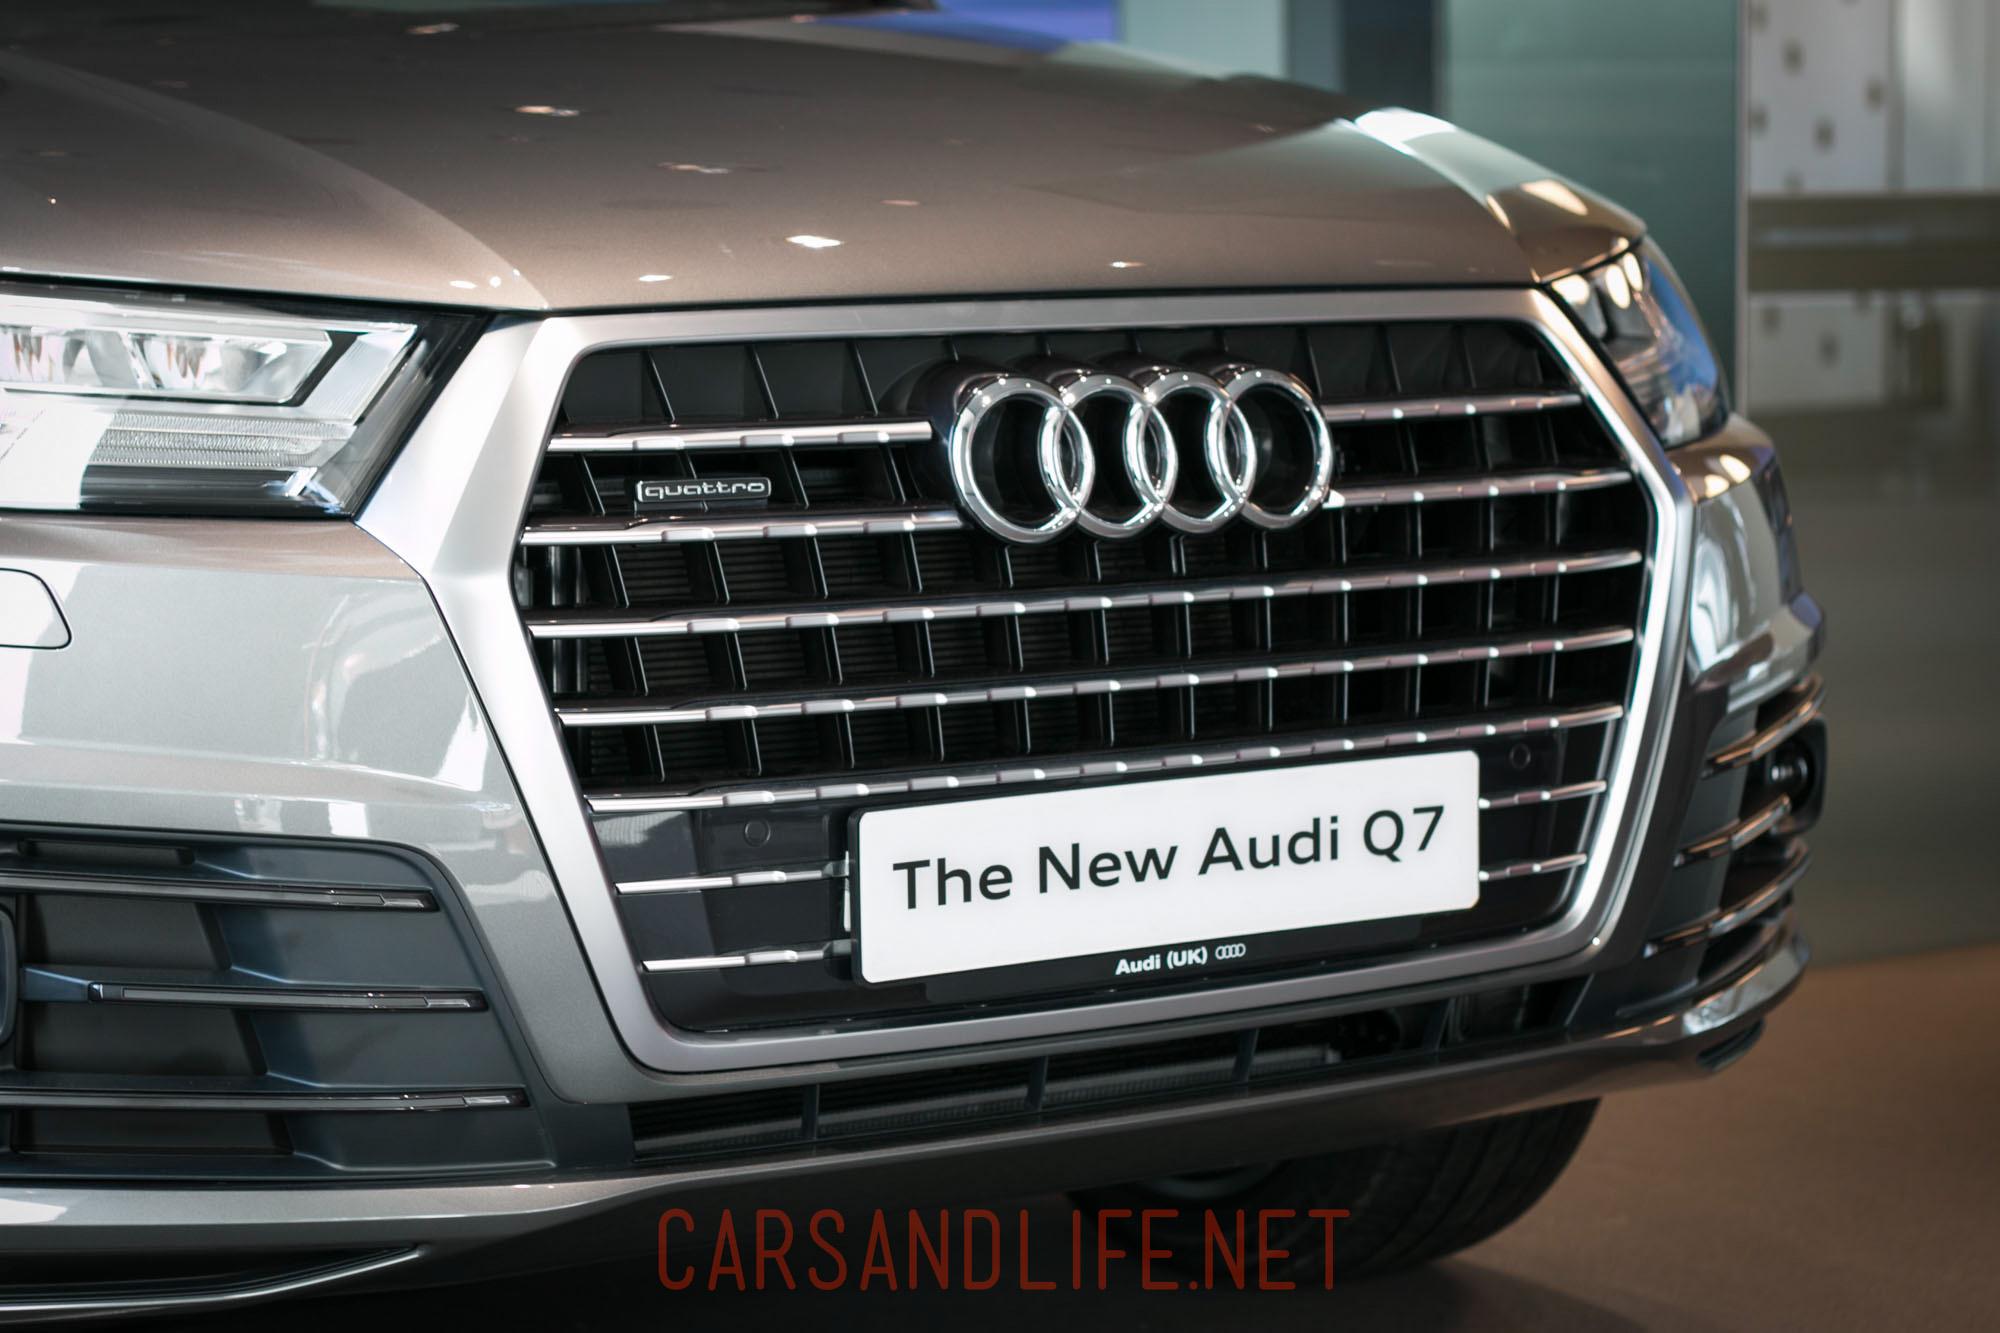 The New Audi Q7 Second Generation